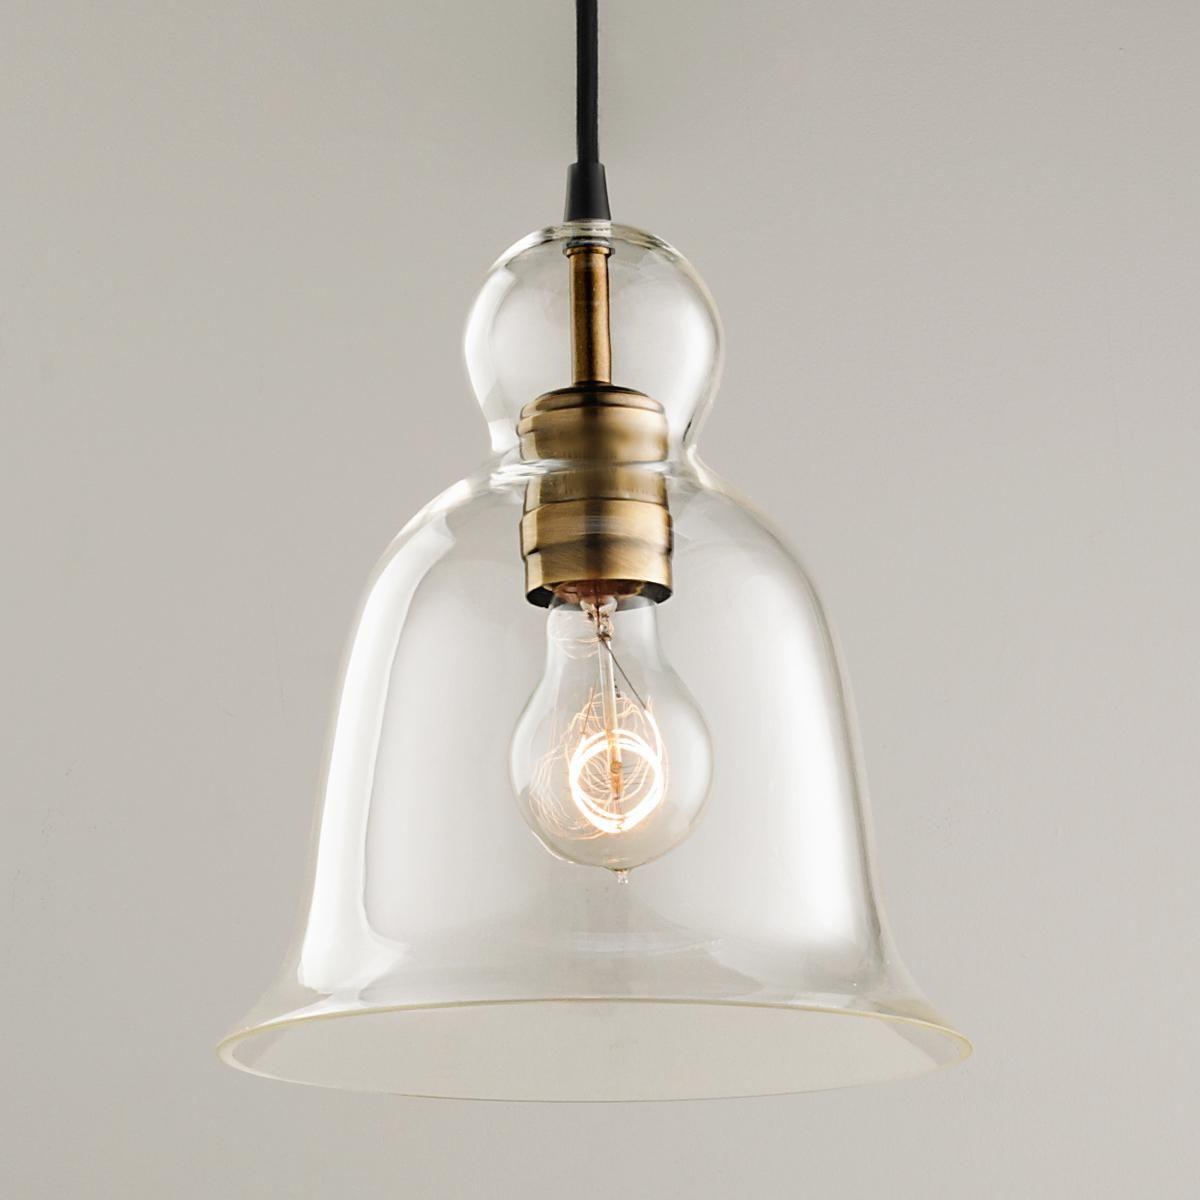 Kitchen Sink Pendant Light Cabinet Organizers Bell Curve Glass Pendants